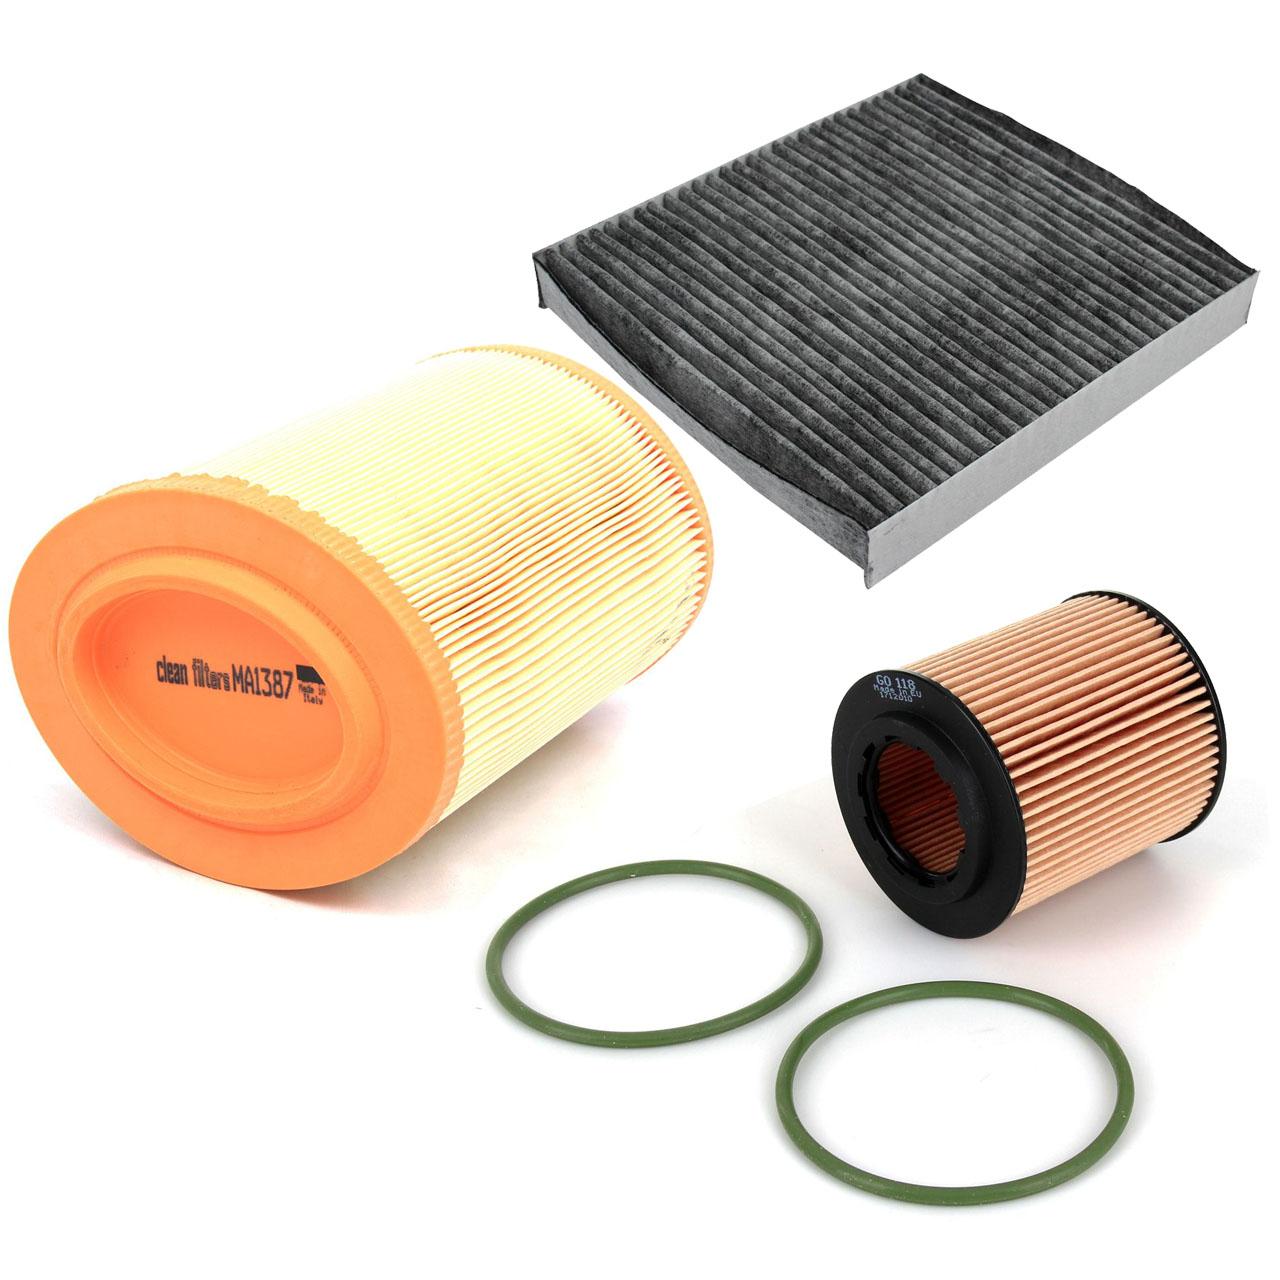 Inspektionskit Filterpaket Filterset ALFA ROMEO 159 (939) 1.9 JTDM 115-150 PS